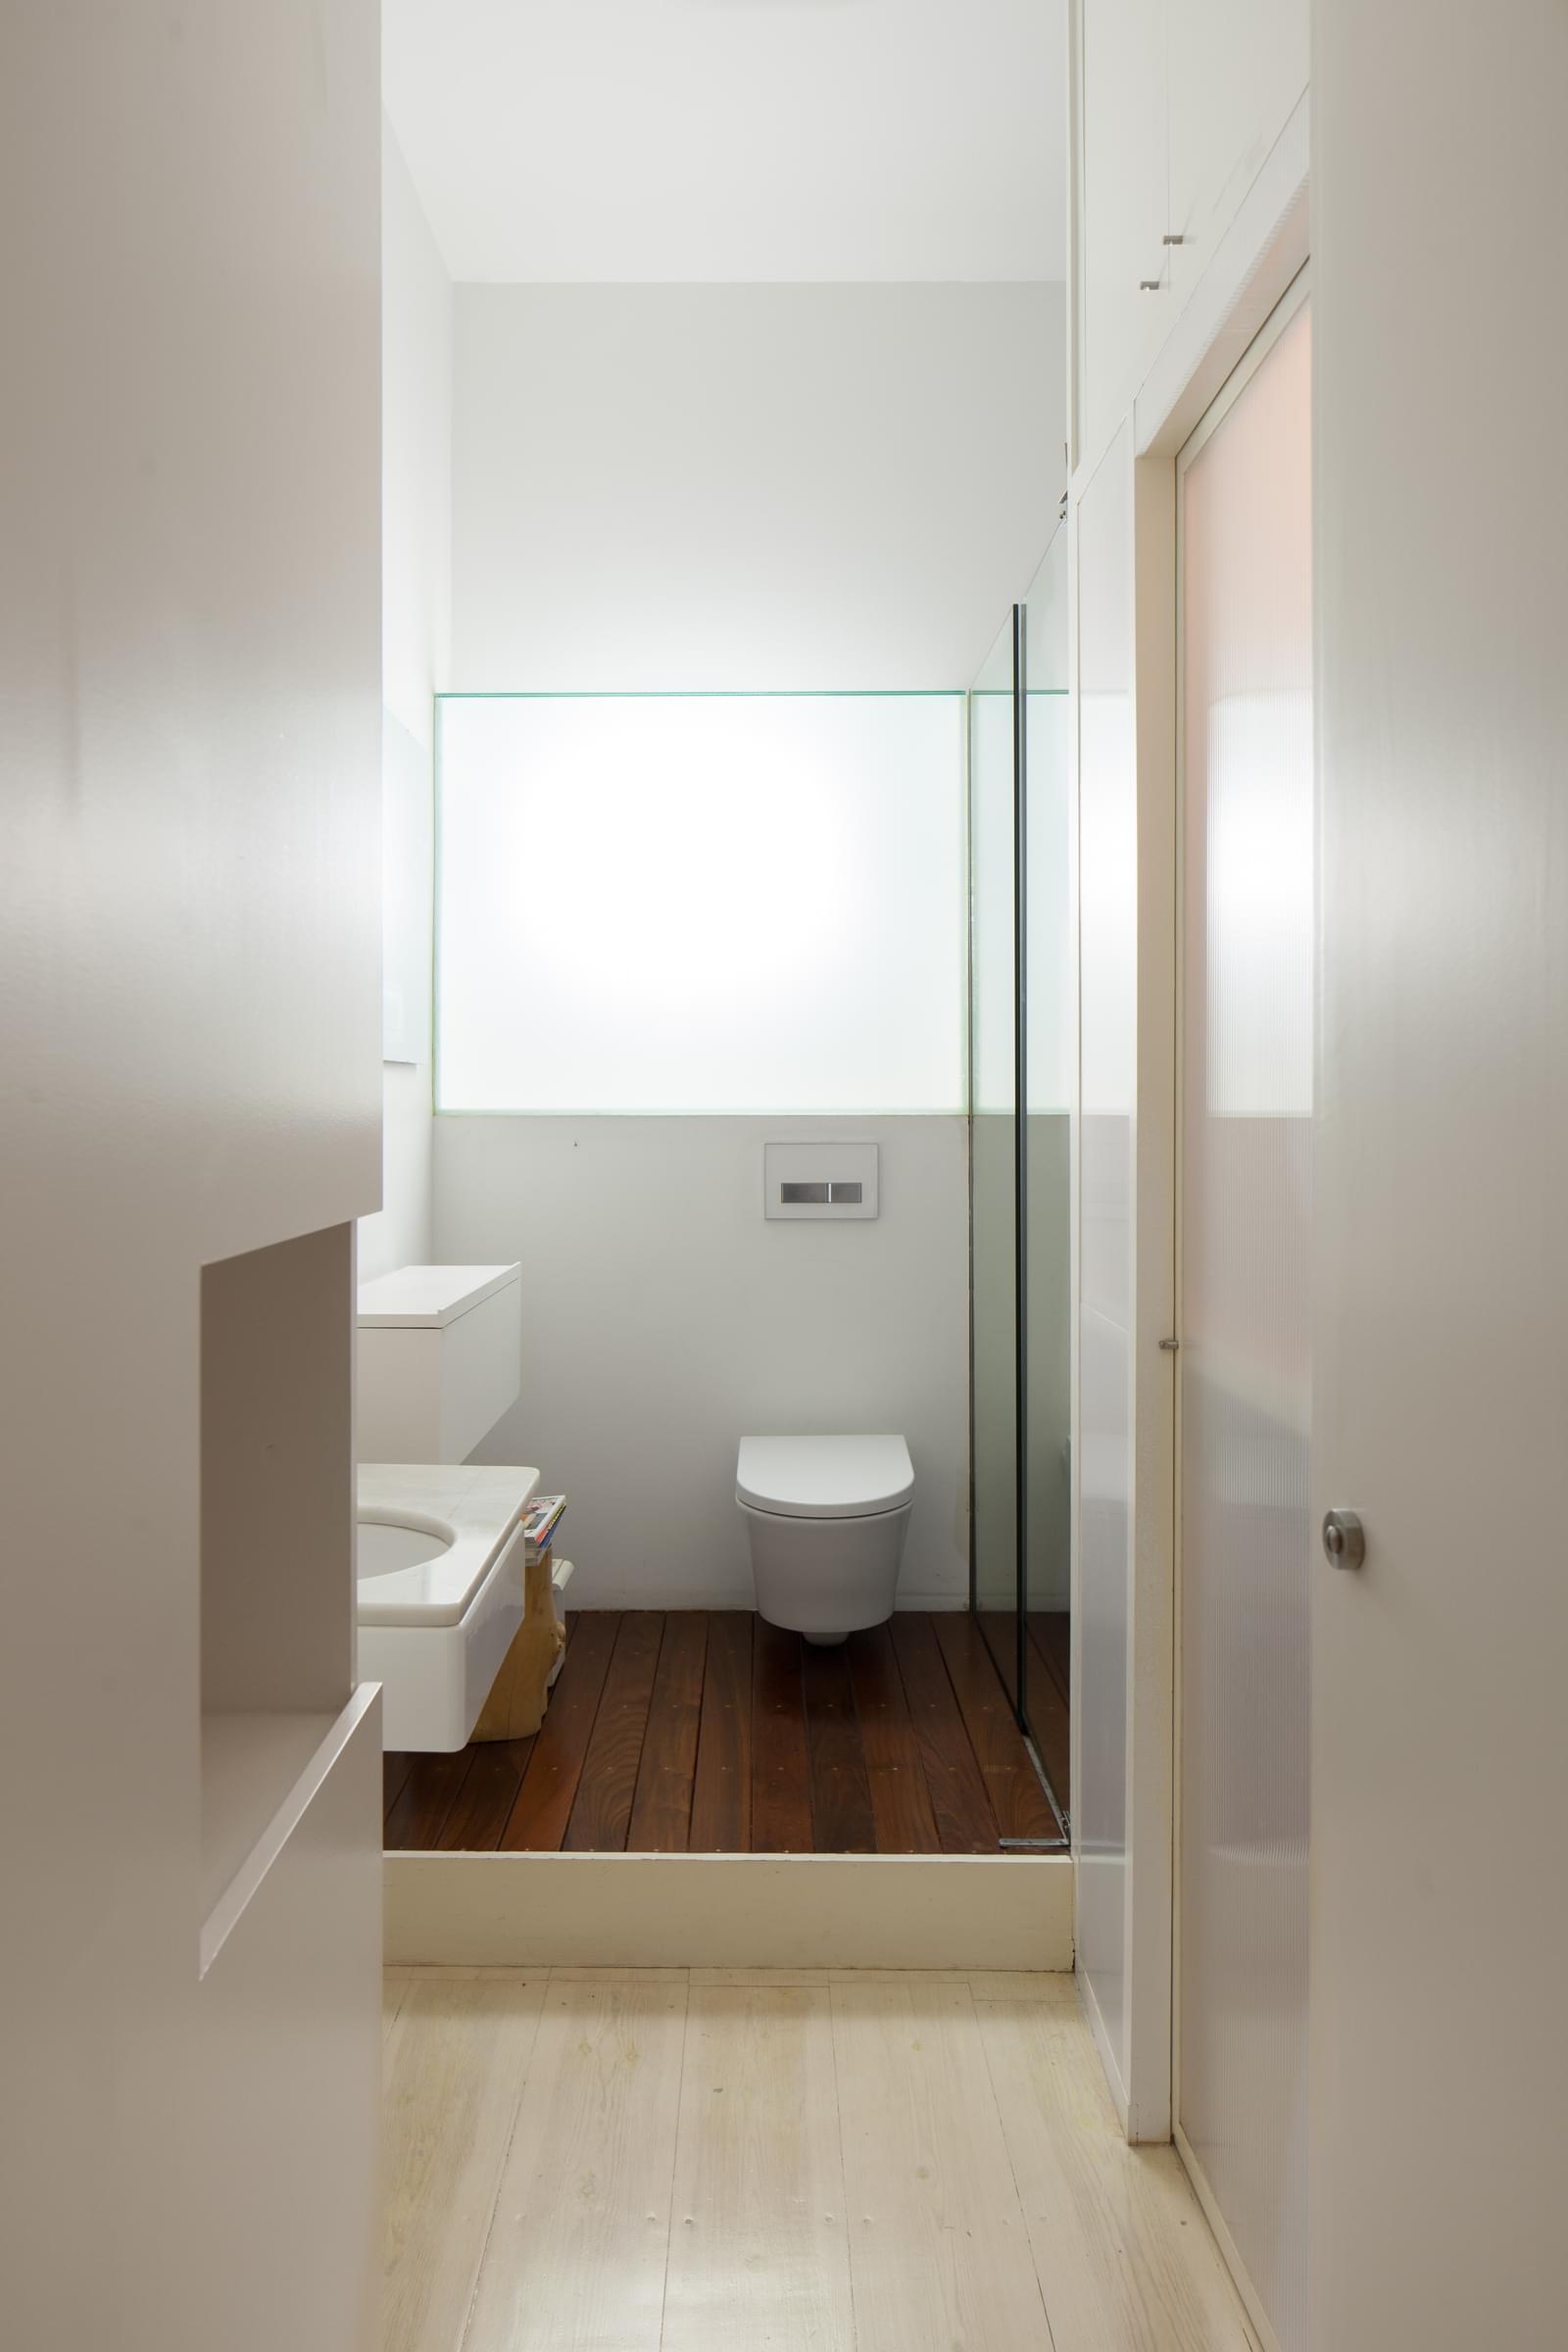 pf17588-apartamento-t4-1-lisboa-faa14933-bc93-49f8-b41b-7abe68a949e0